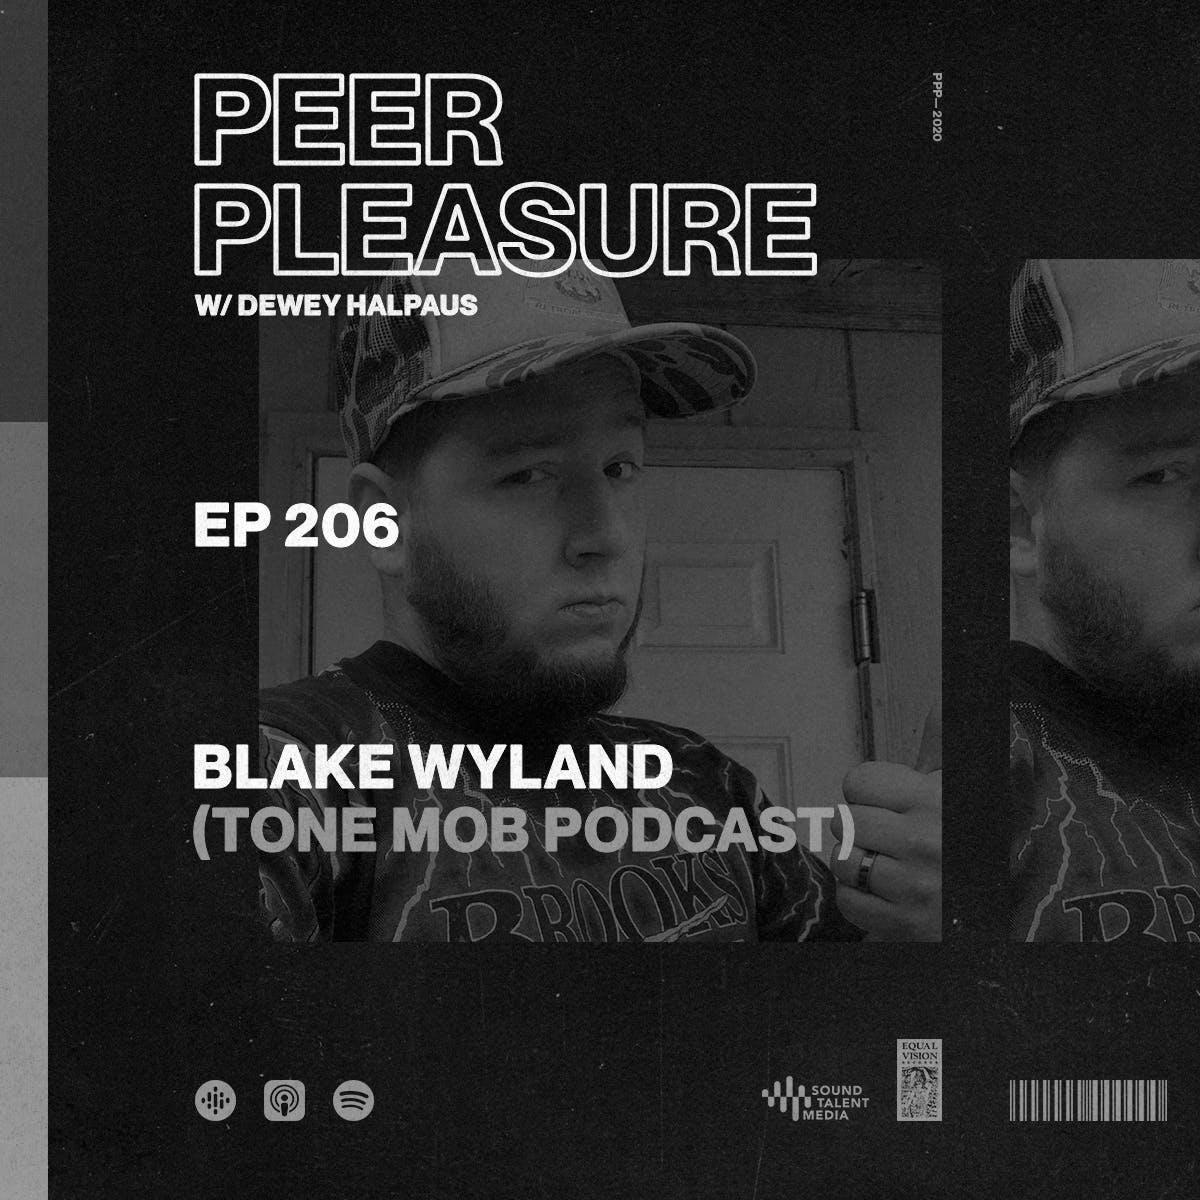 Blake Wyland (Tone Mob Podcast)